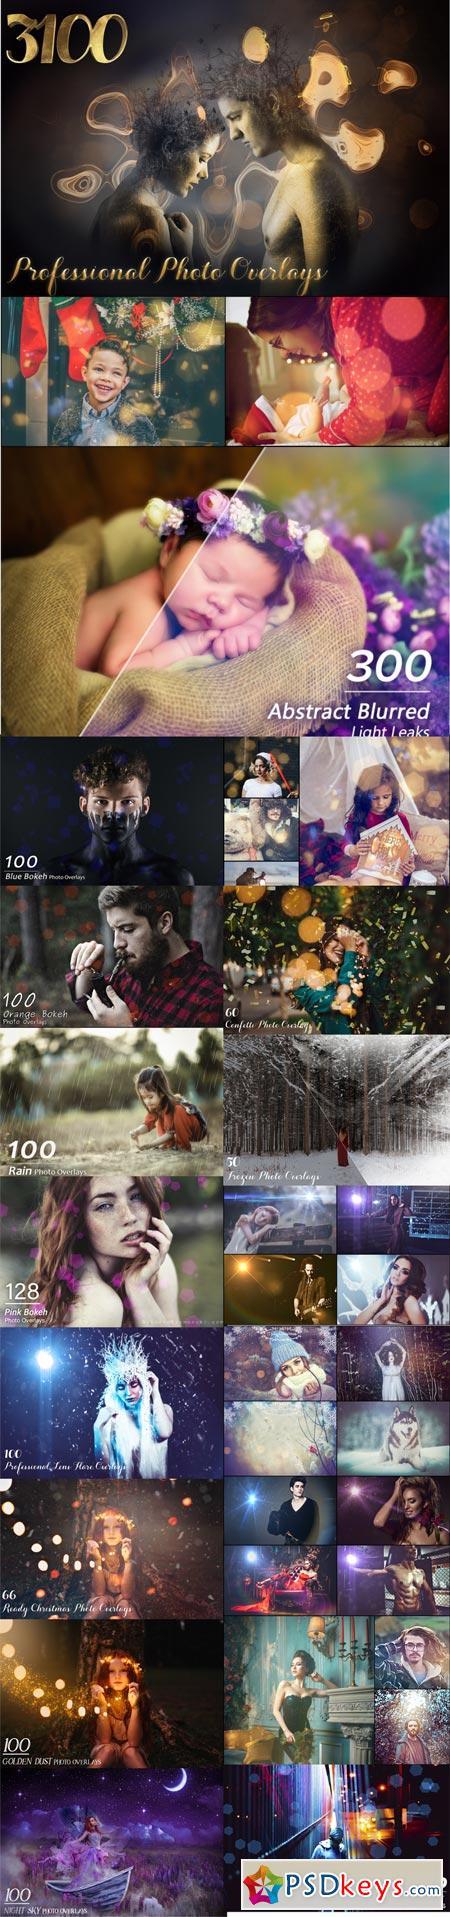 3108 Professional Photo Overlays 3520485